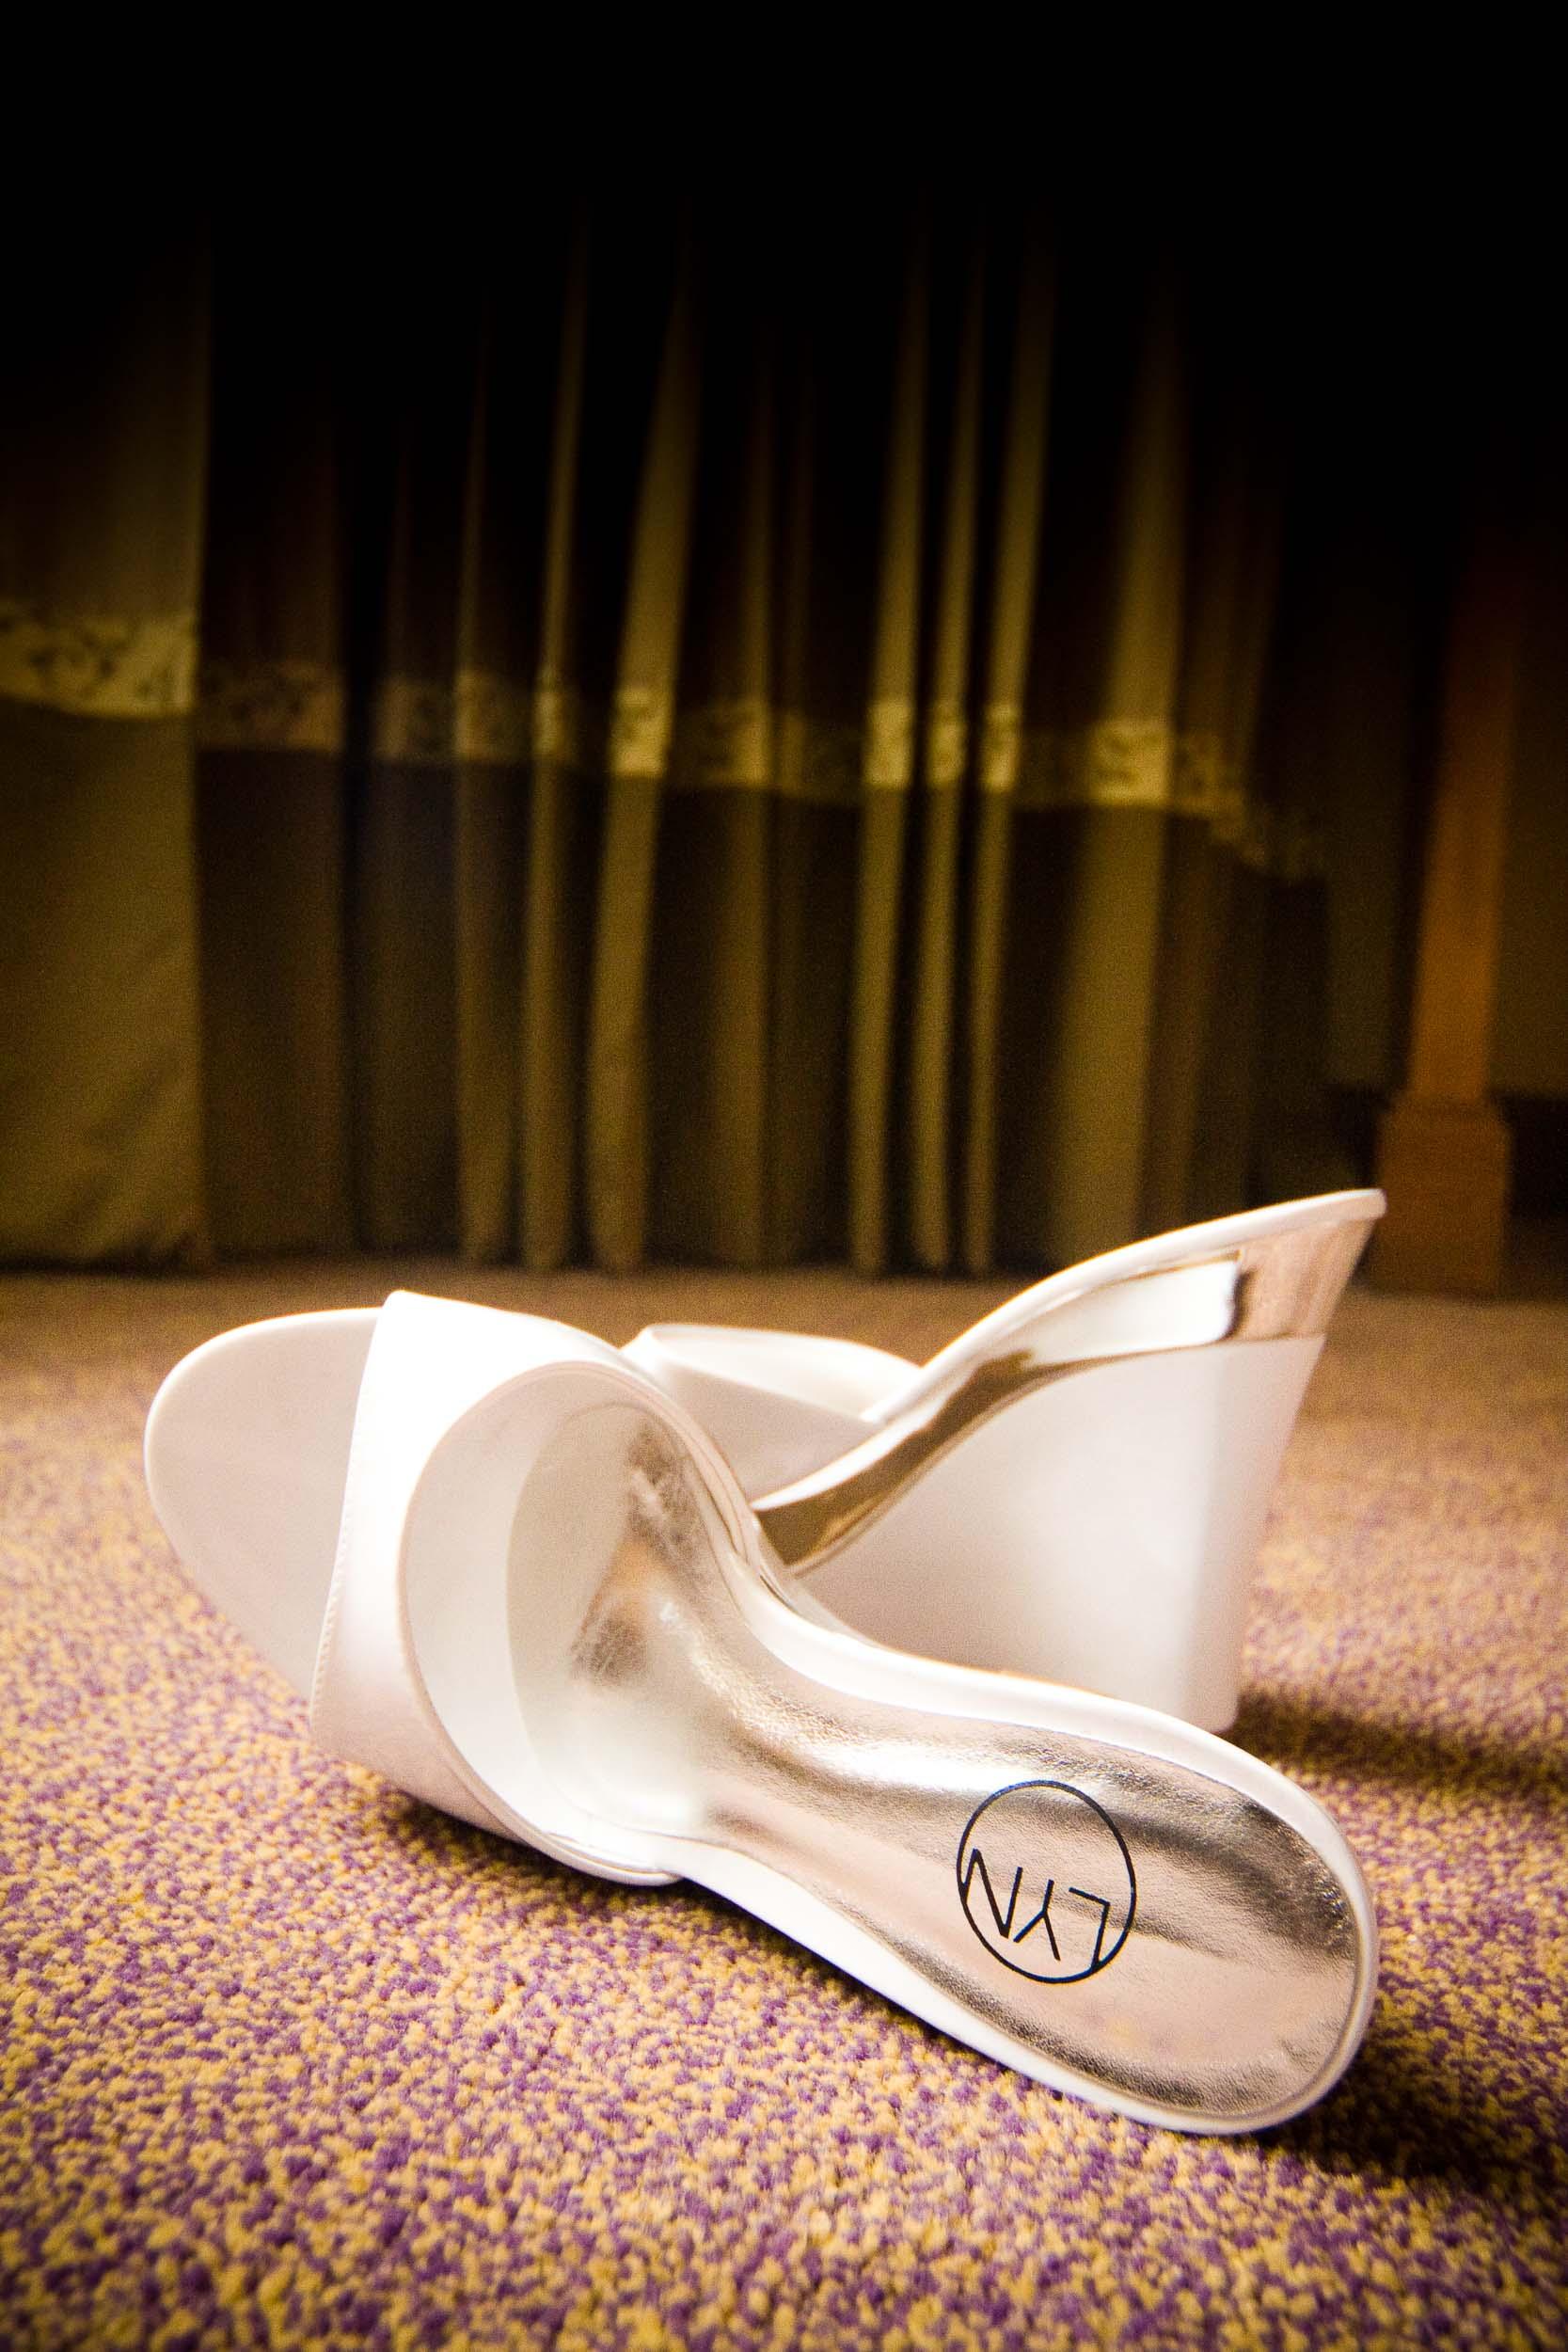 Wedding at Rama Garden Hotel in Bangkok, Thailand. ภาพงานแต่งงาน ที่ โรงแรมรามาการ์เด้นส์